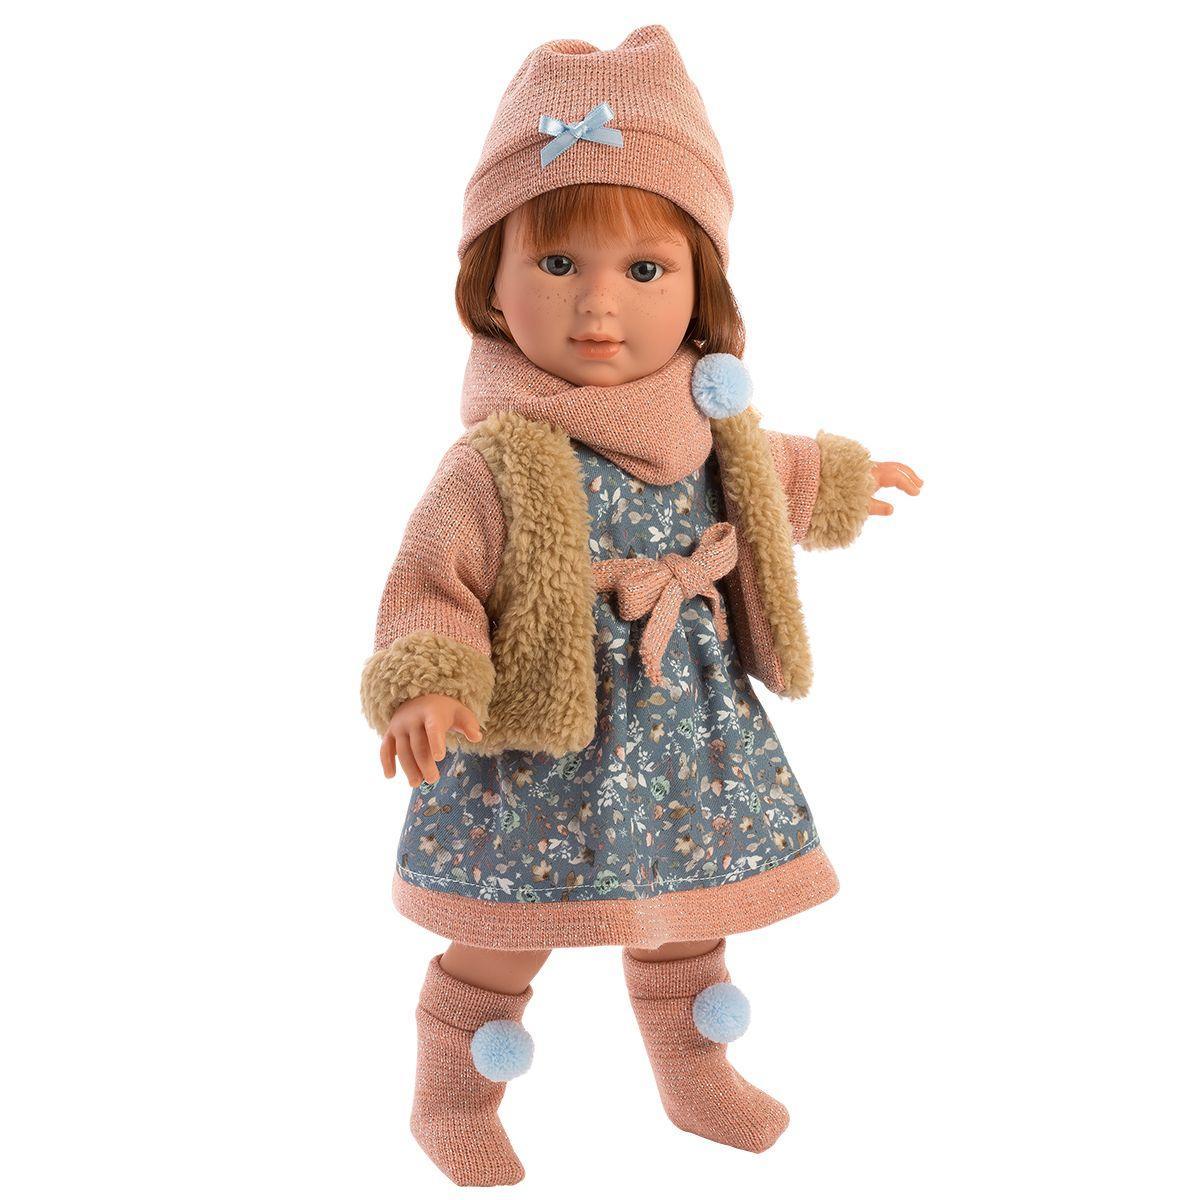 Шарнирная кукла Мартина, 40 см, Llorens 54030